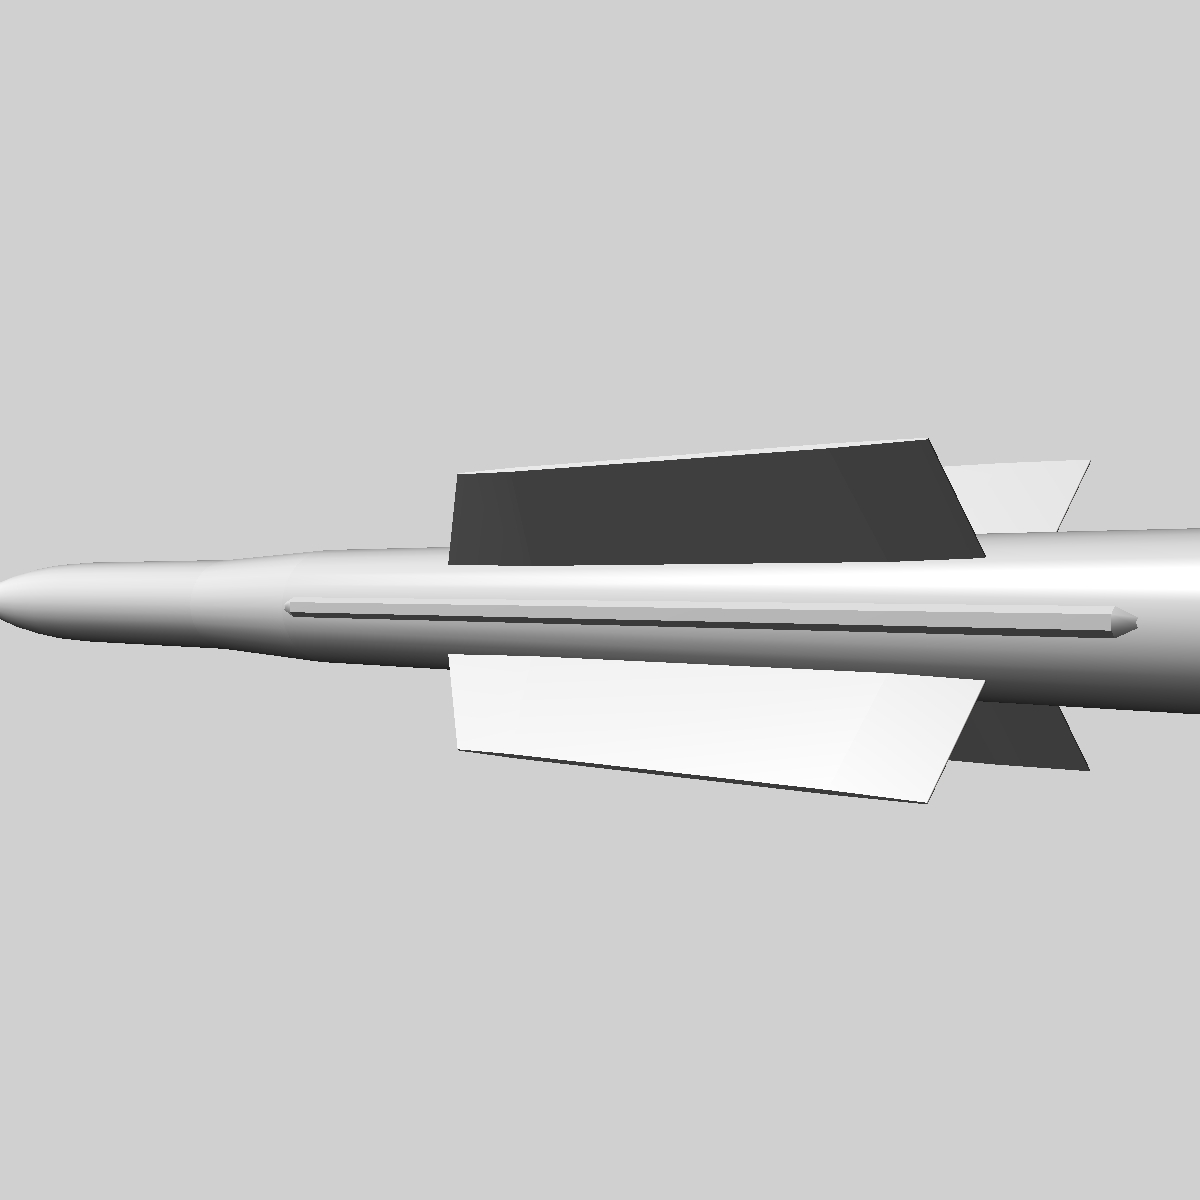 iranian taer-2 eldflaug 3d líkan 3ds dxf x þorskskoða obj 149245